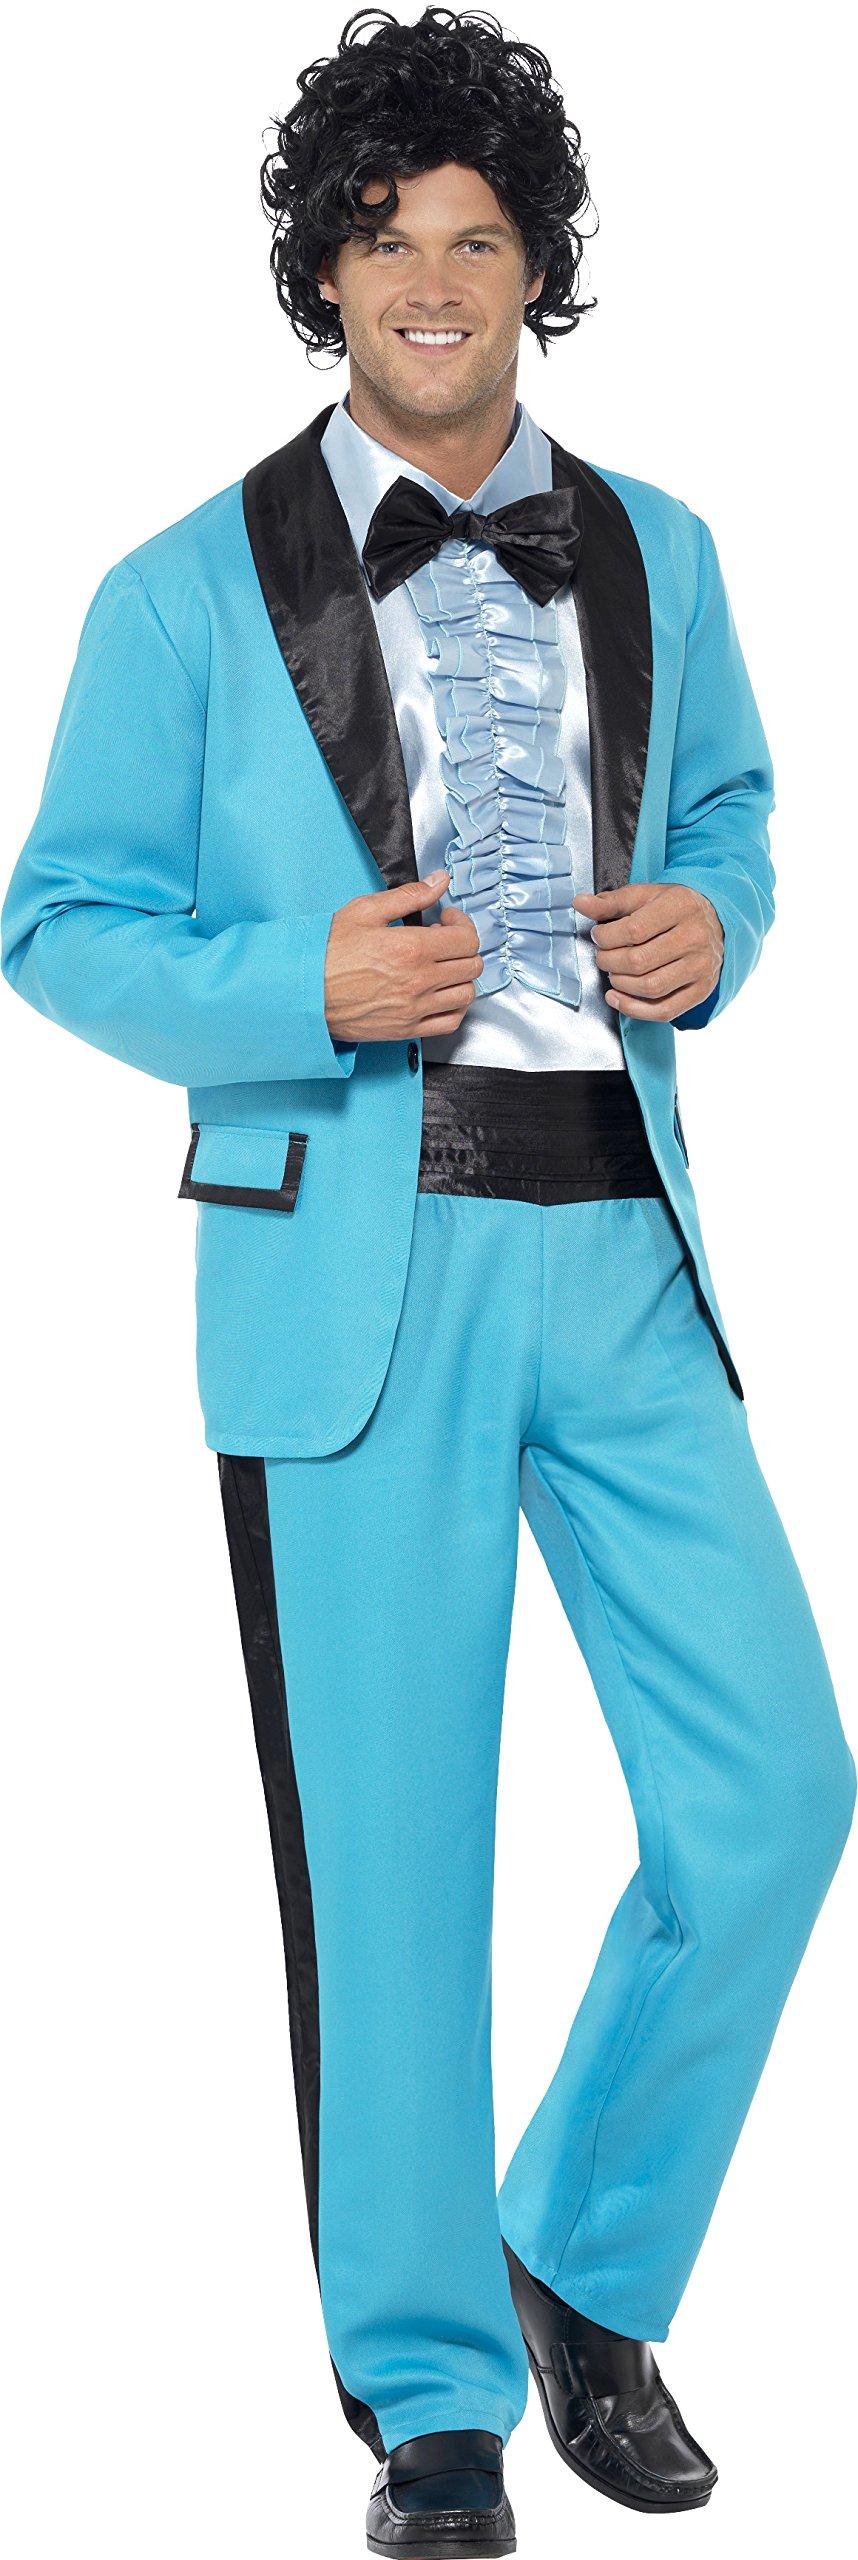 Men's 80's Costumes: Amazon.com